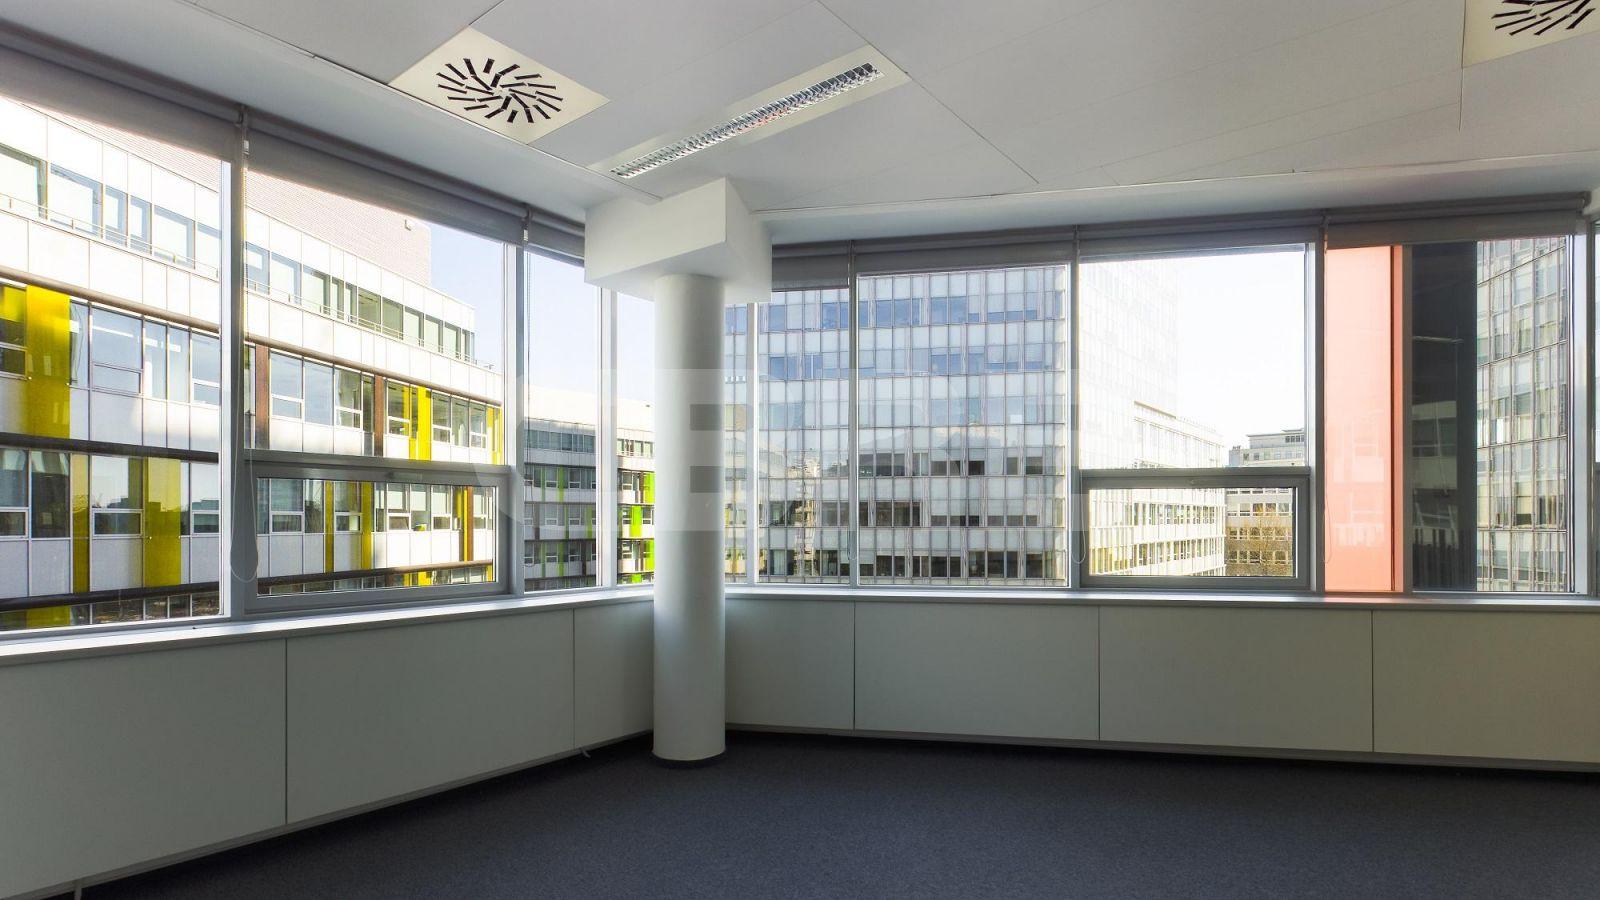 Green Point Offices - Block F+G, Bratislava - Ružinov | Offices for rent by CBRE | 2